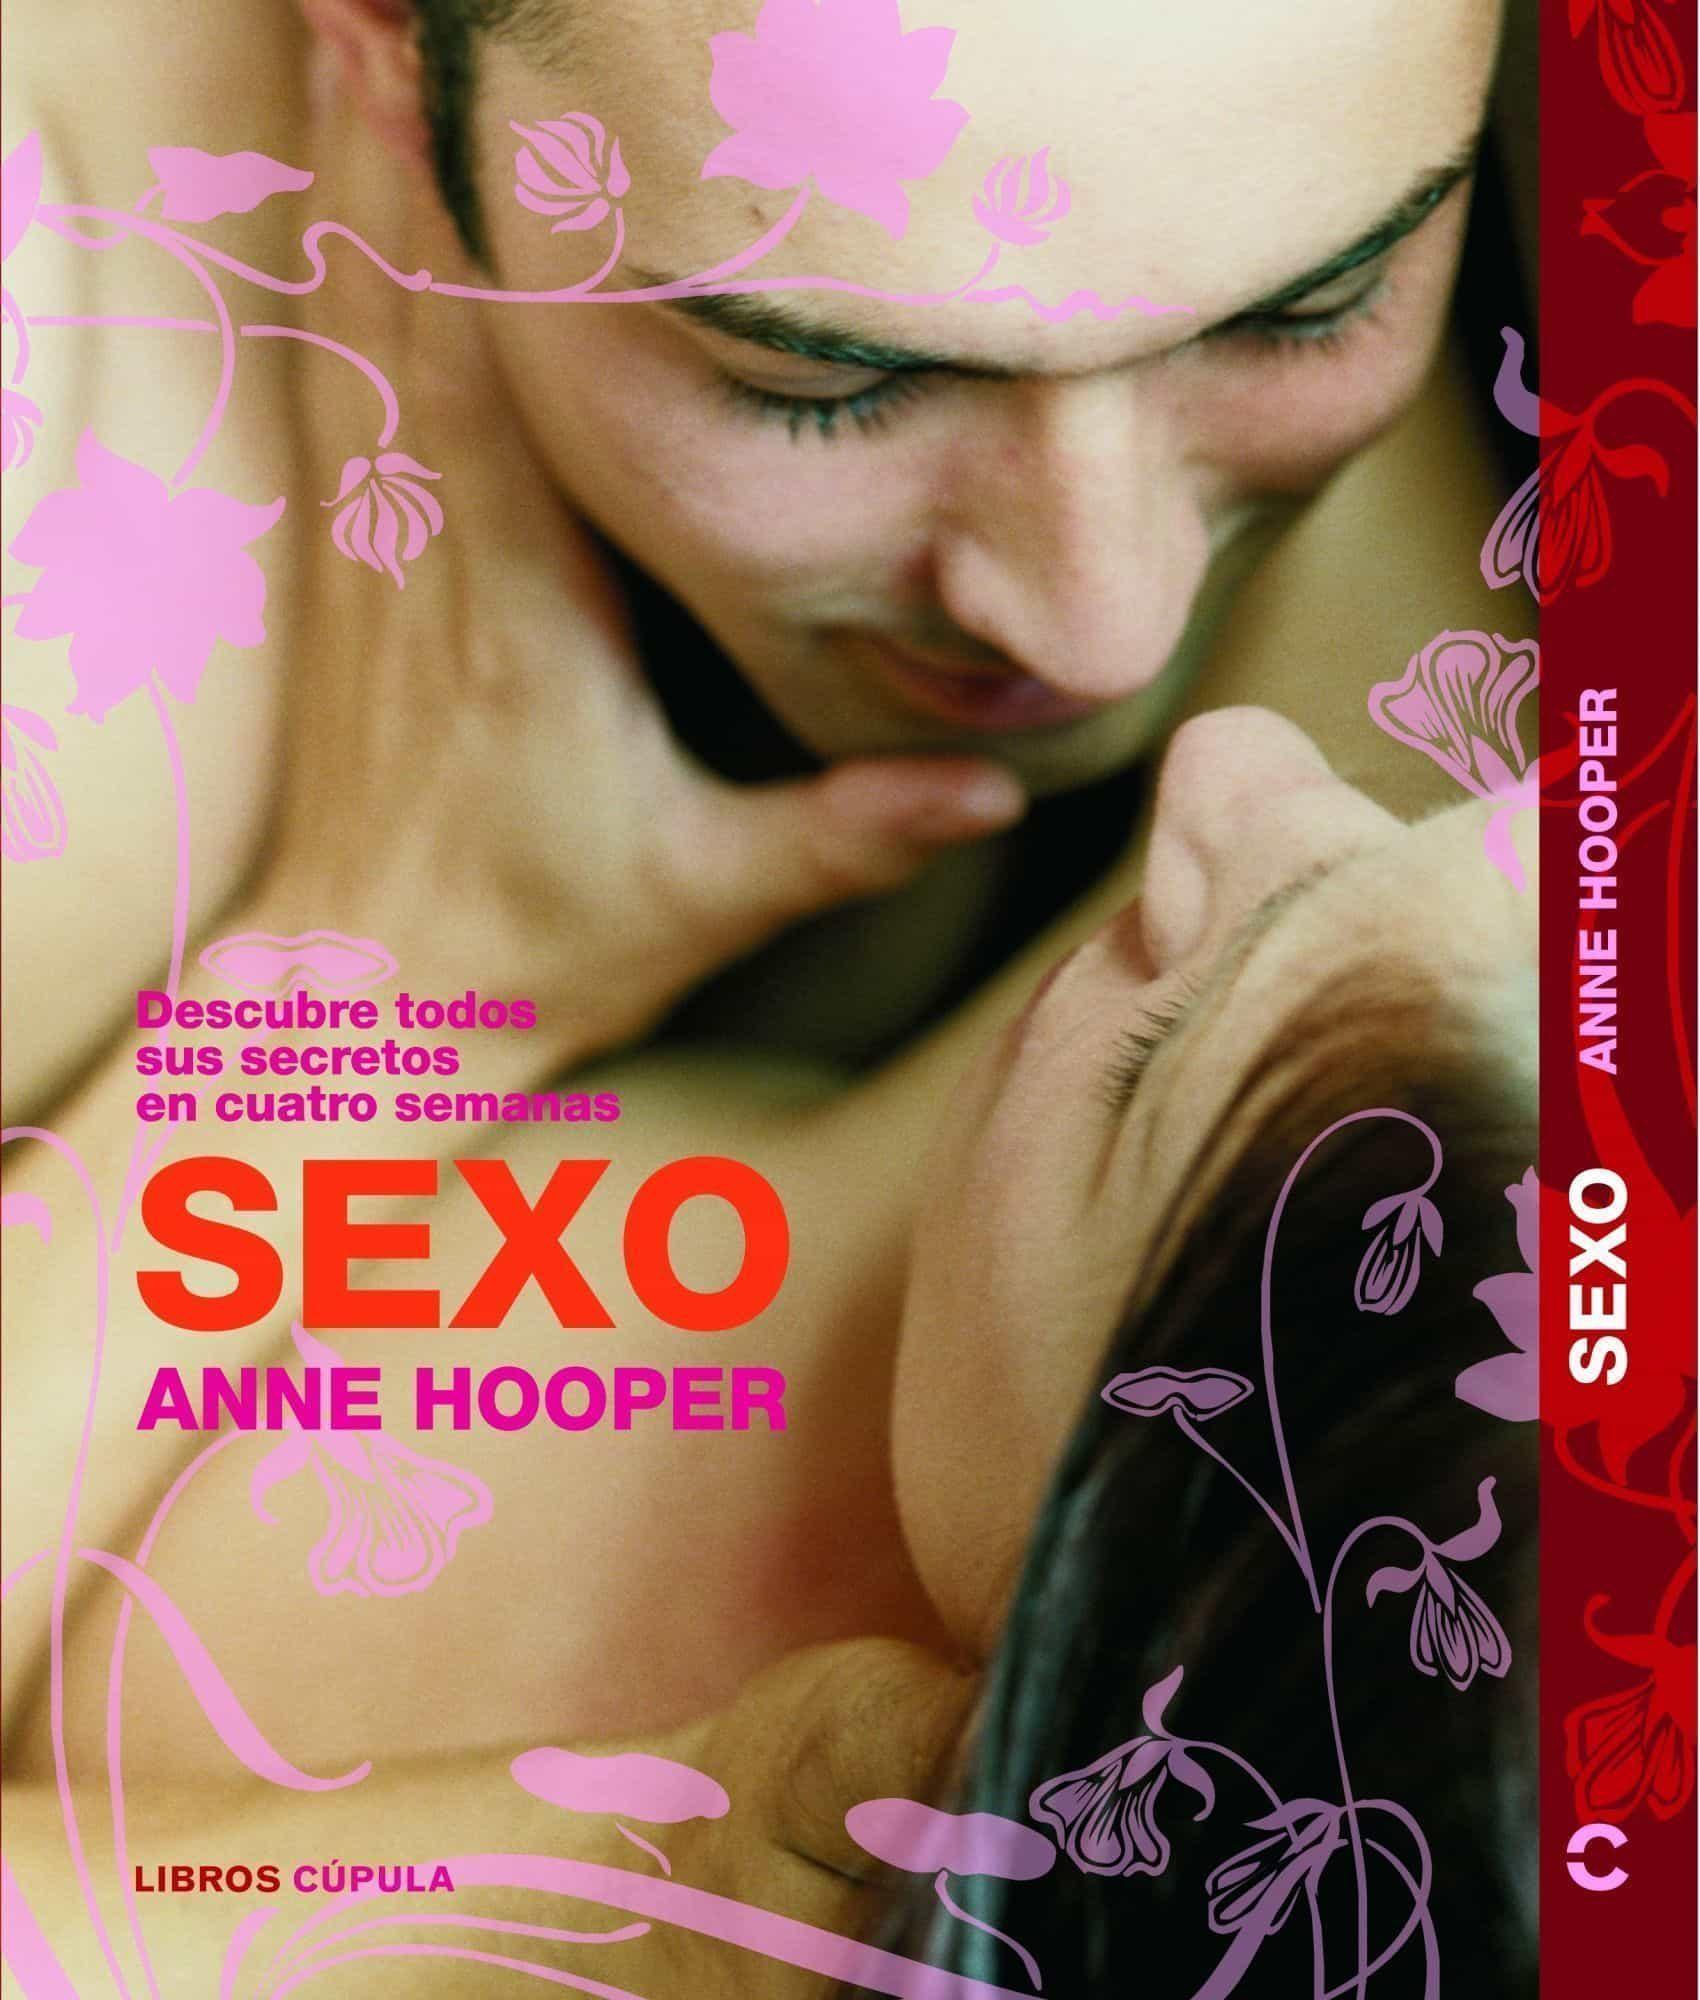 Sexo: Descubre Todos Sus Secretos (incluye Cd) por Anne Hooper epub